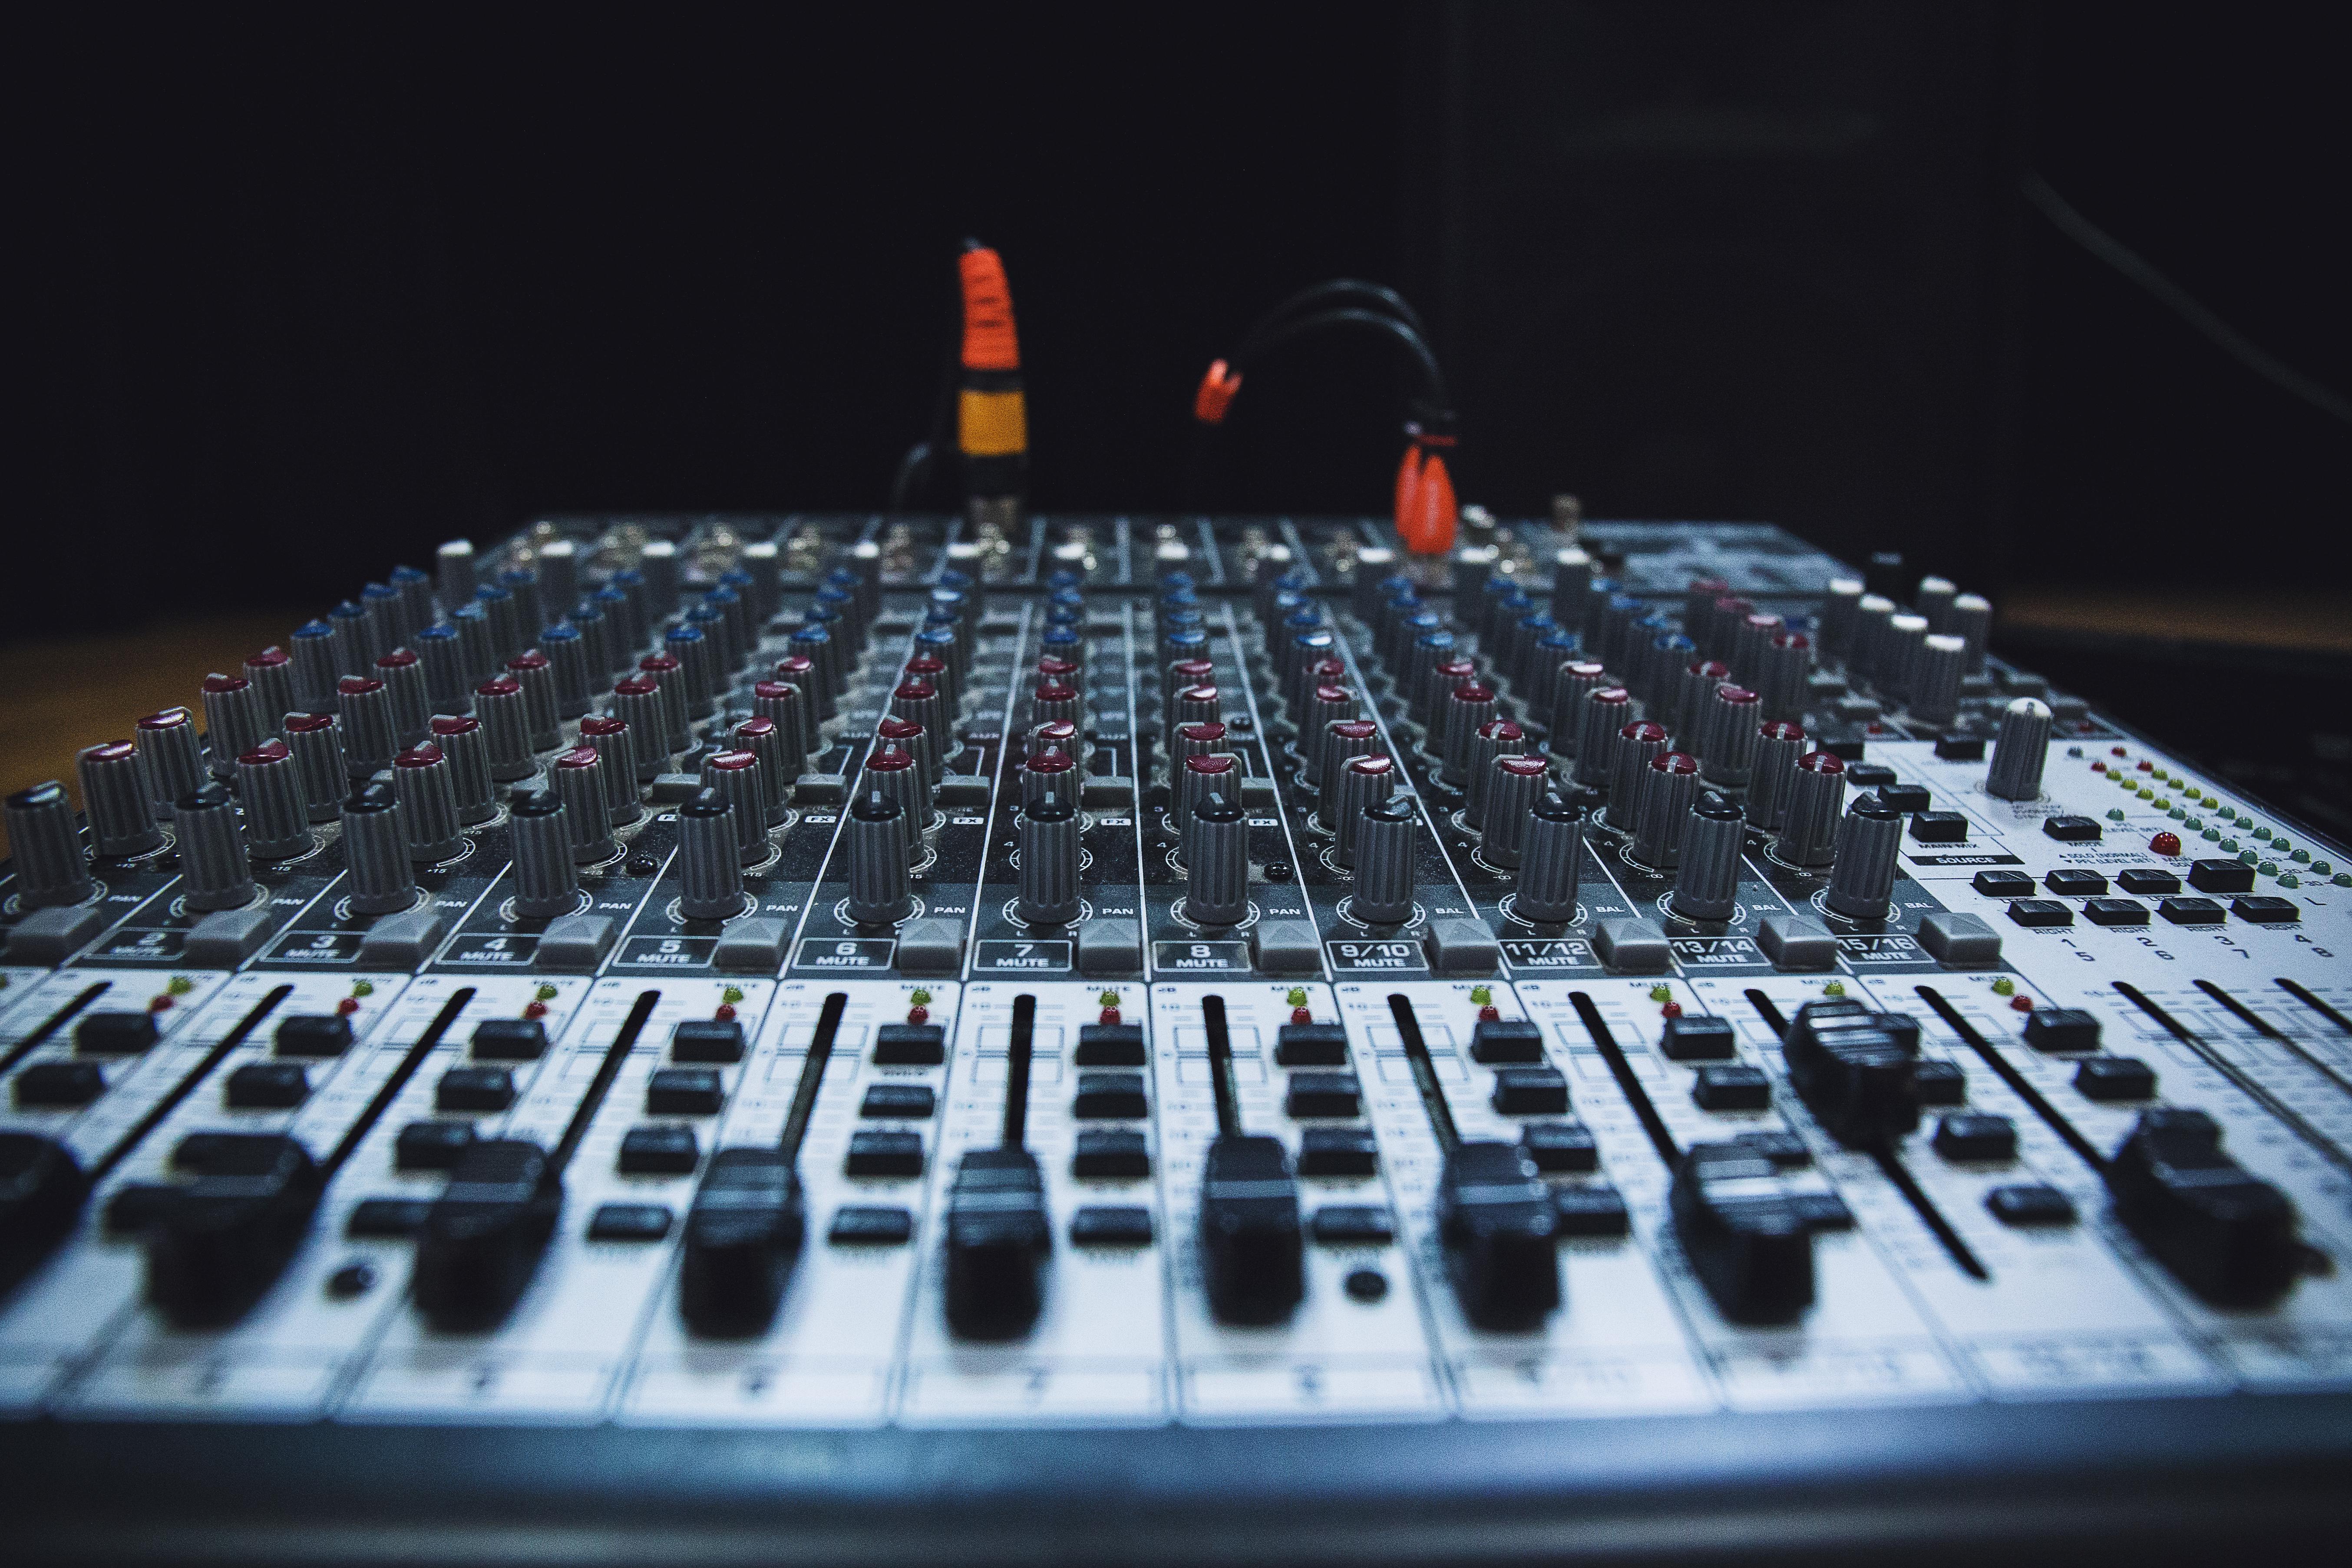 Free Images : music, technology, studio, equalizer, audio equipment